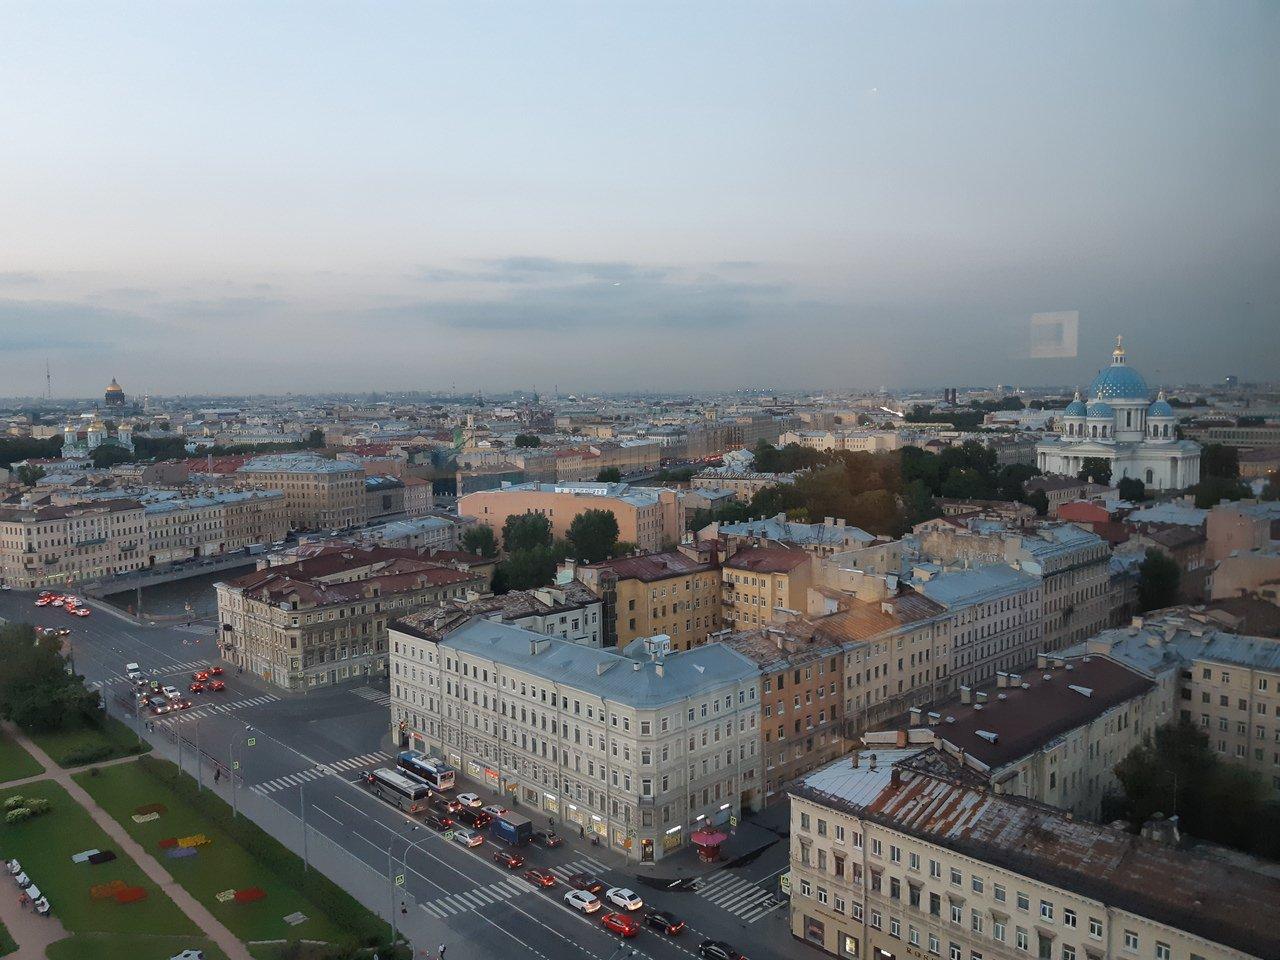 vue panoramique de st petersbourg